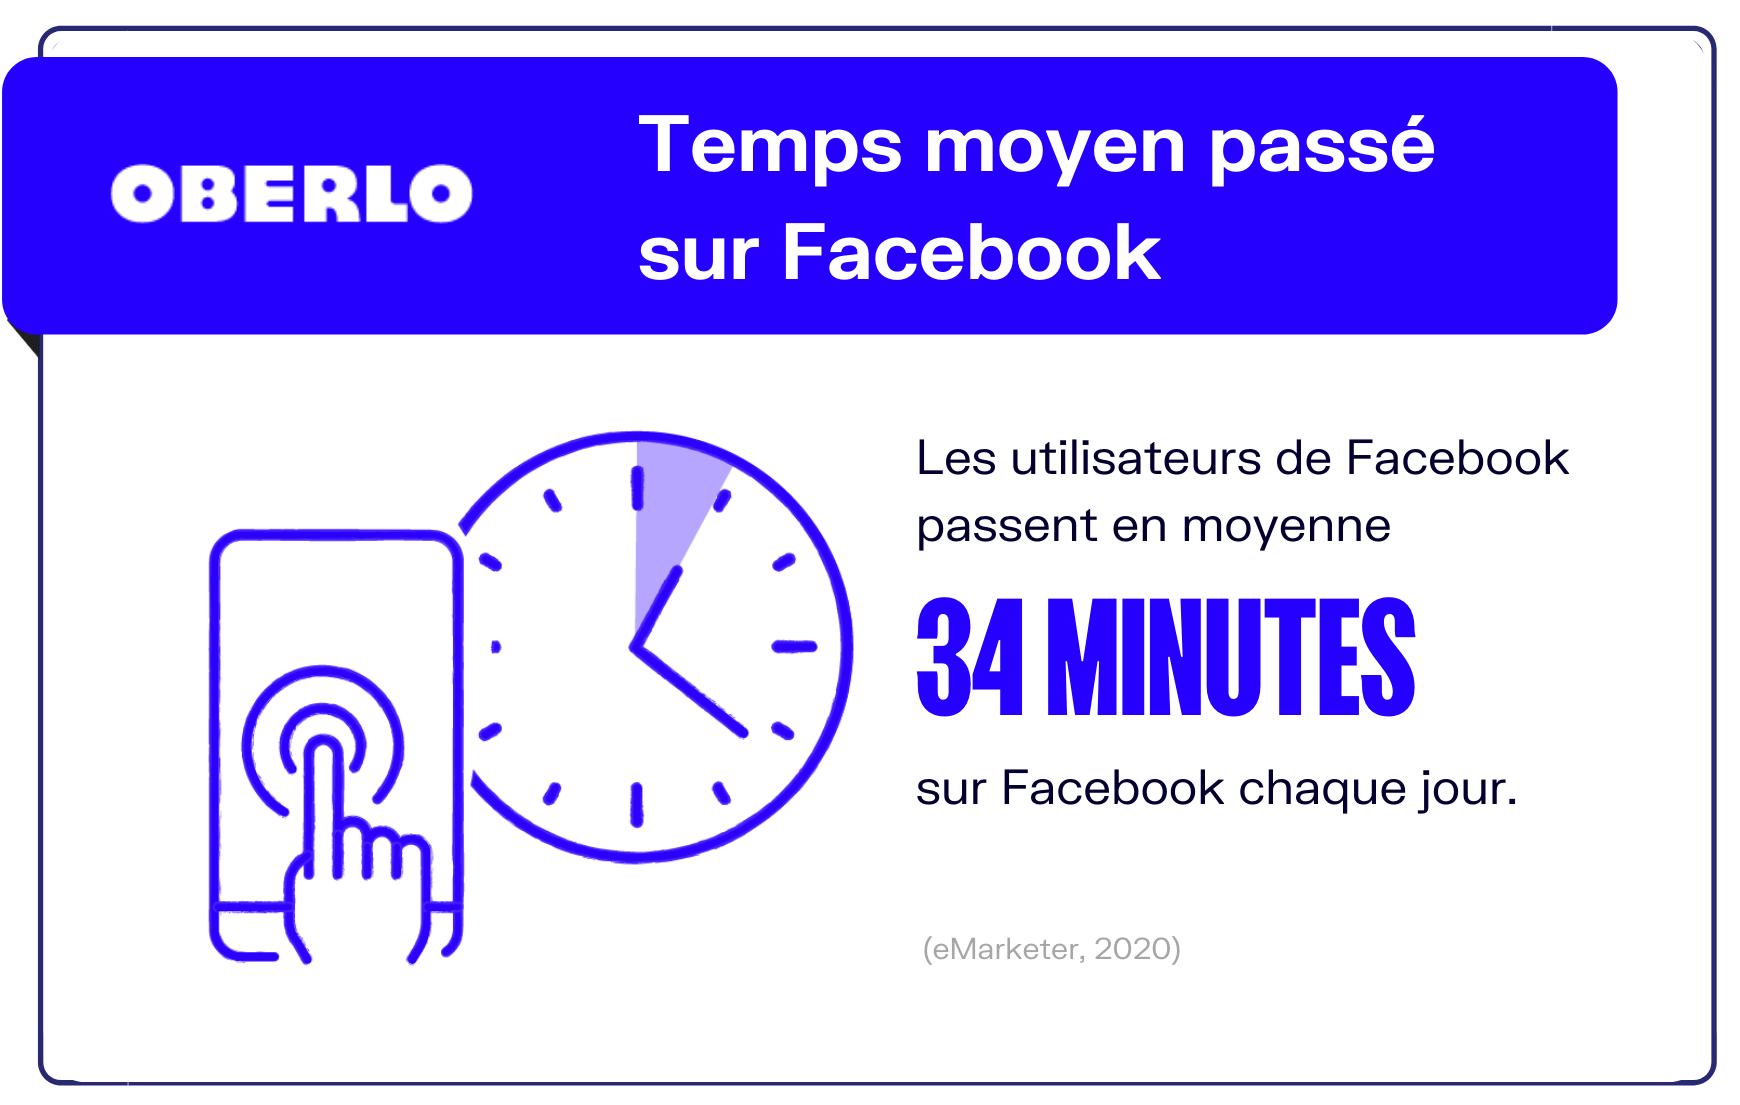 temps moyen passé sur Facebook